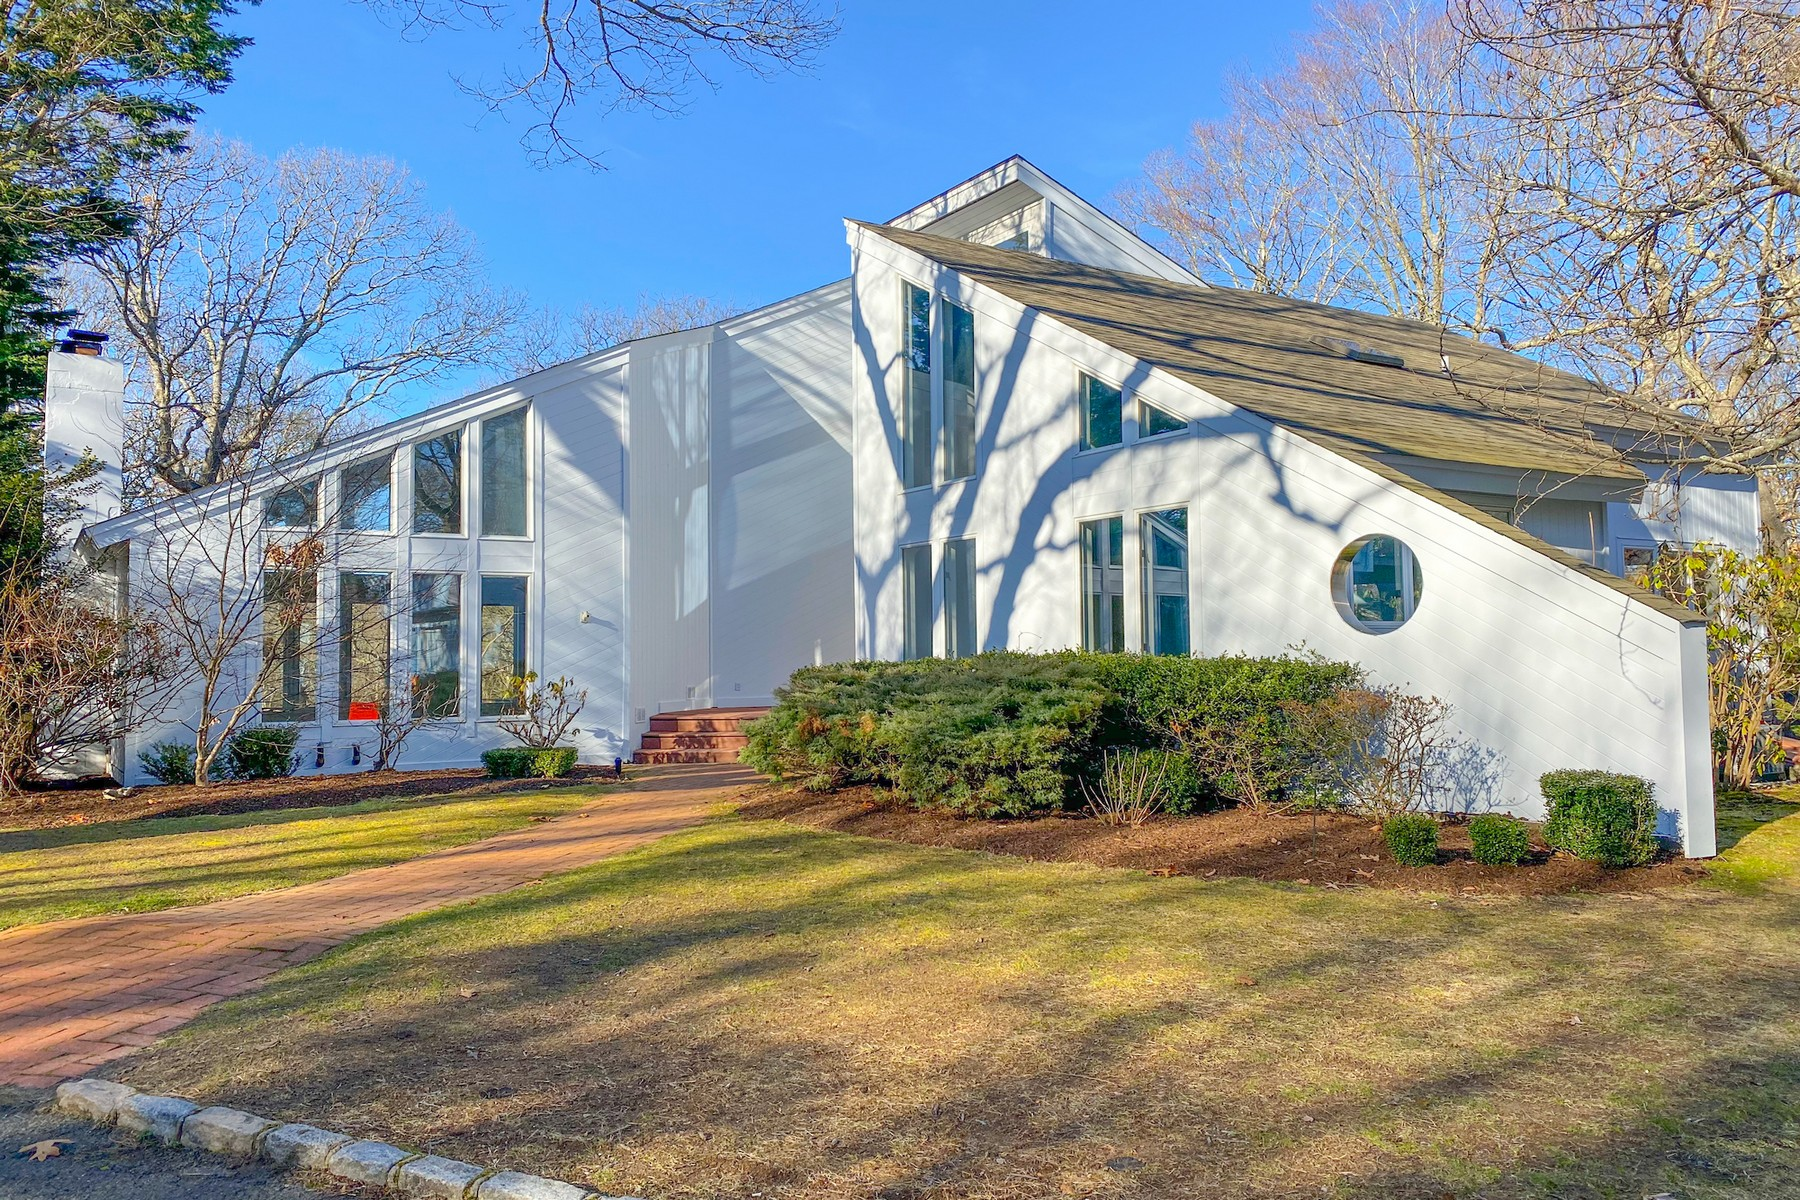 Single Family Homes for Active at Mattituck 1839 Meday Avenue Mattituck, New York 11952 United States